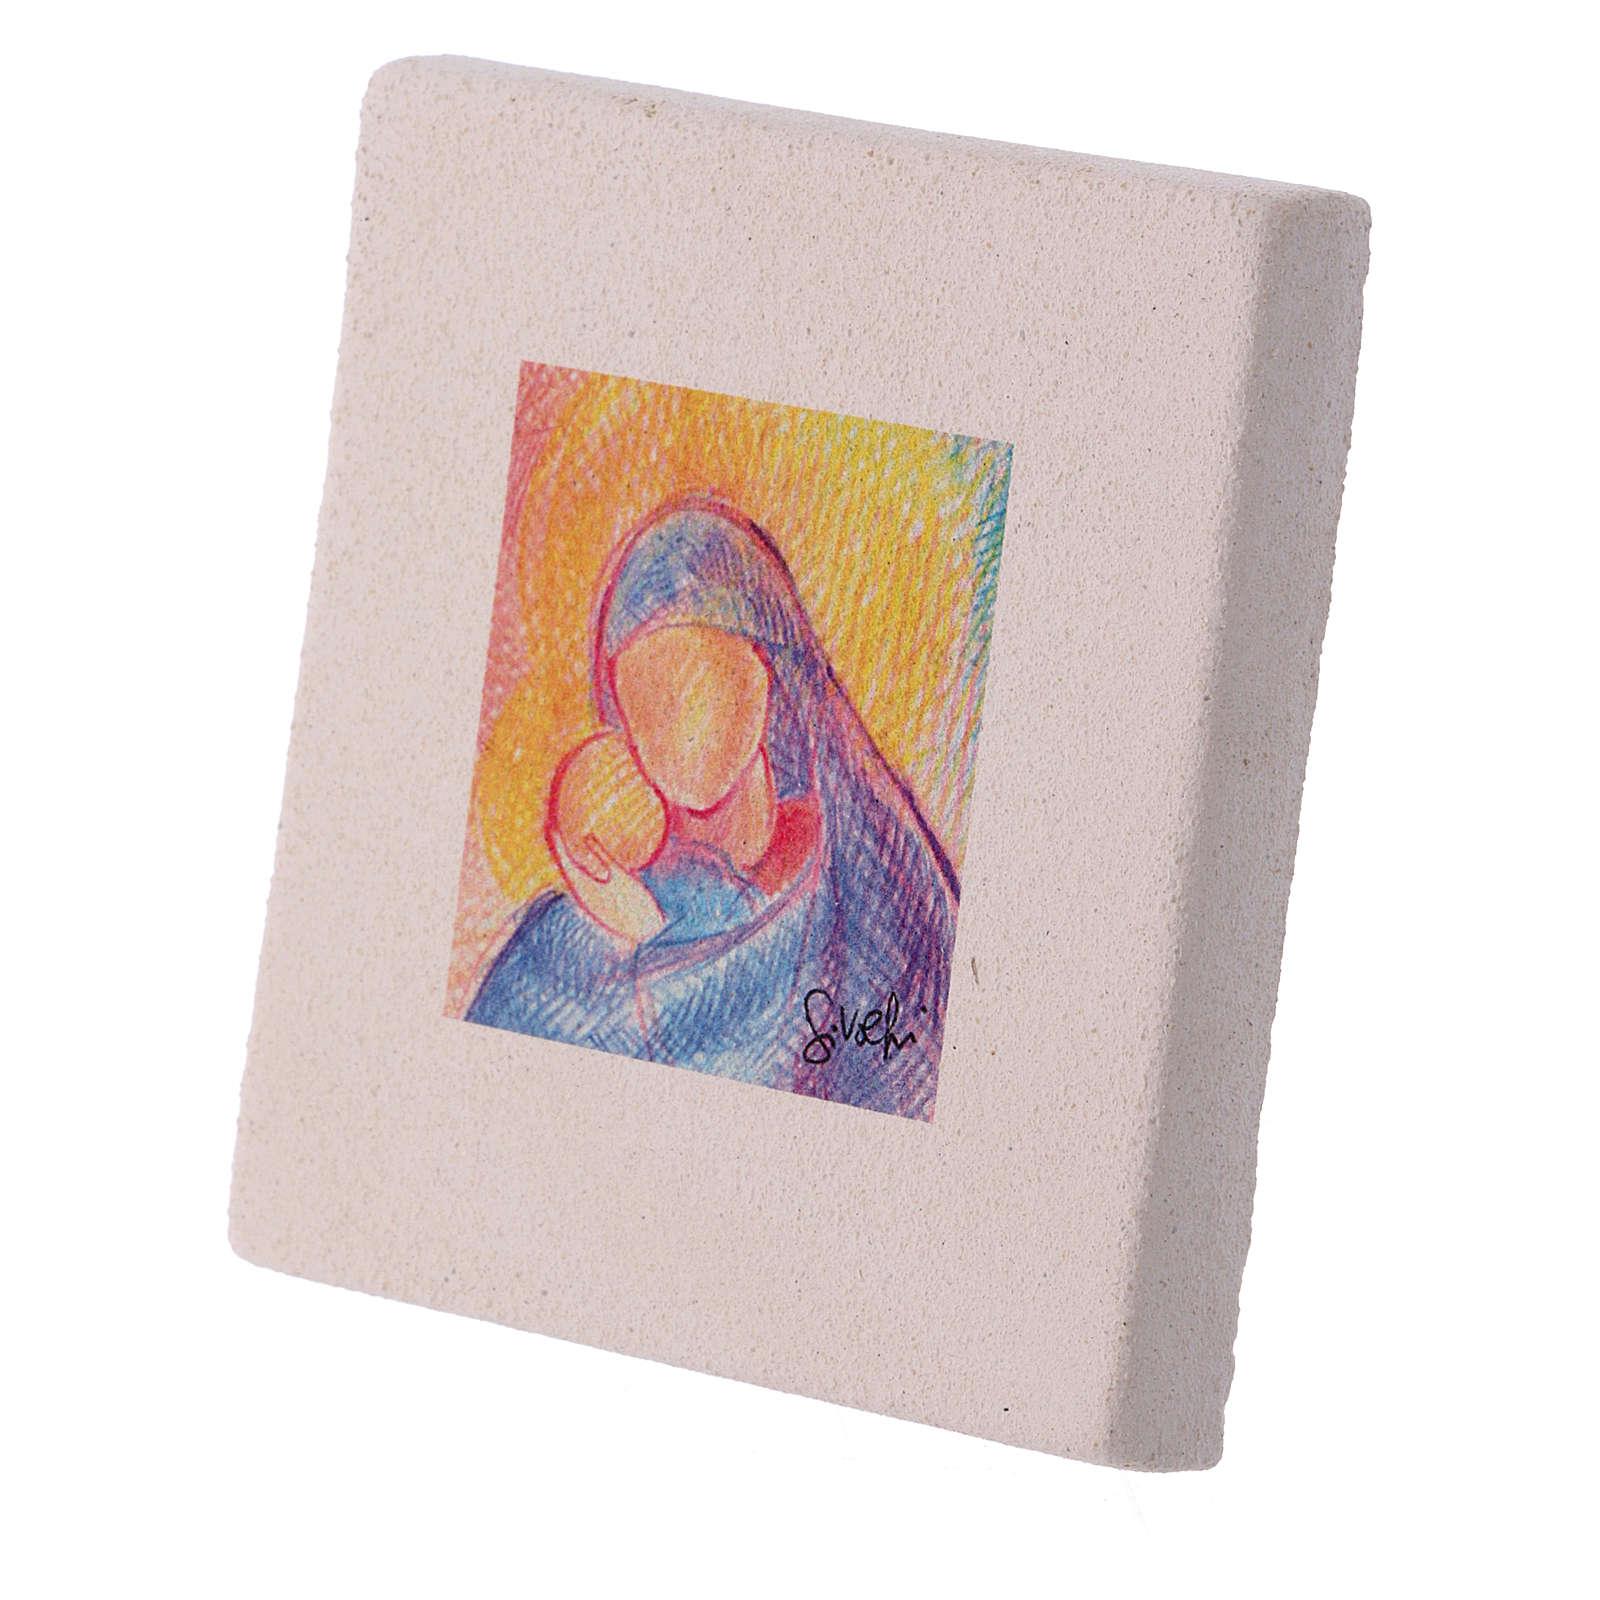 Christmas miniature the hug between Mary and Jesus 10X10 cm 3